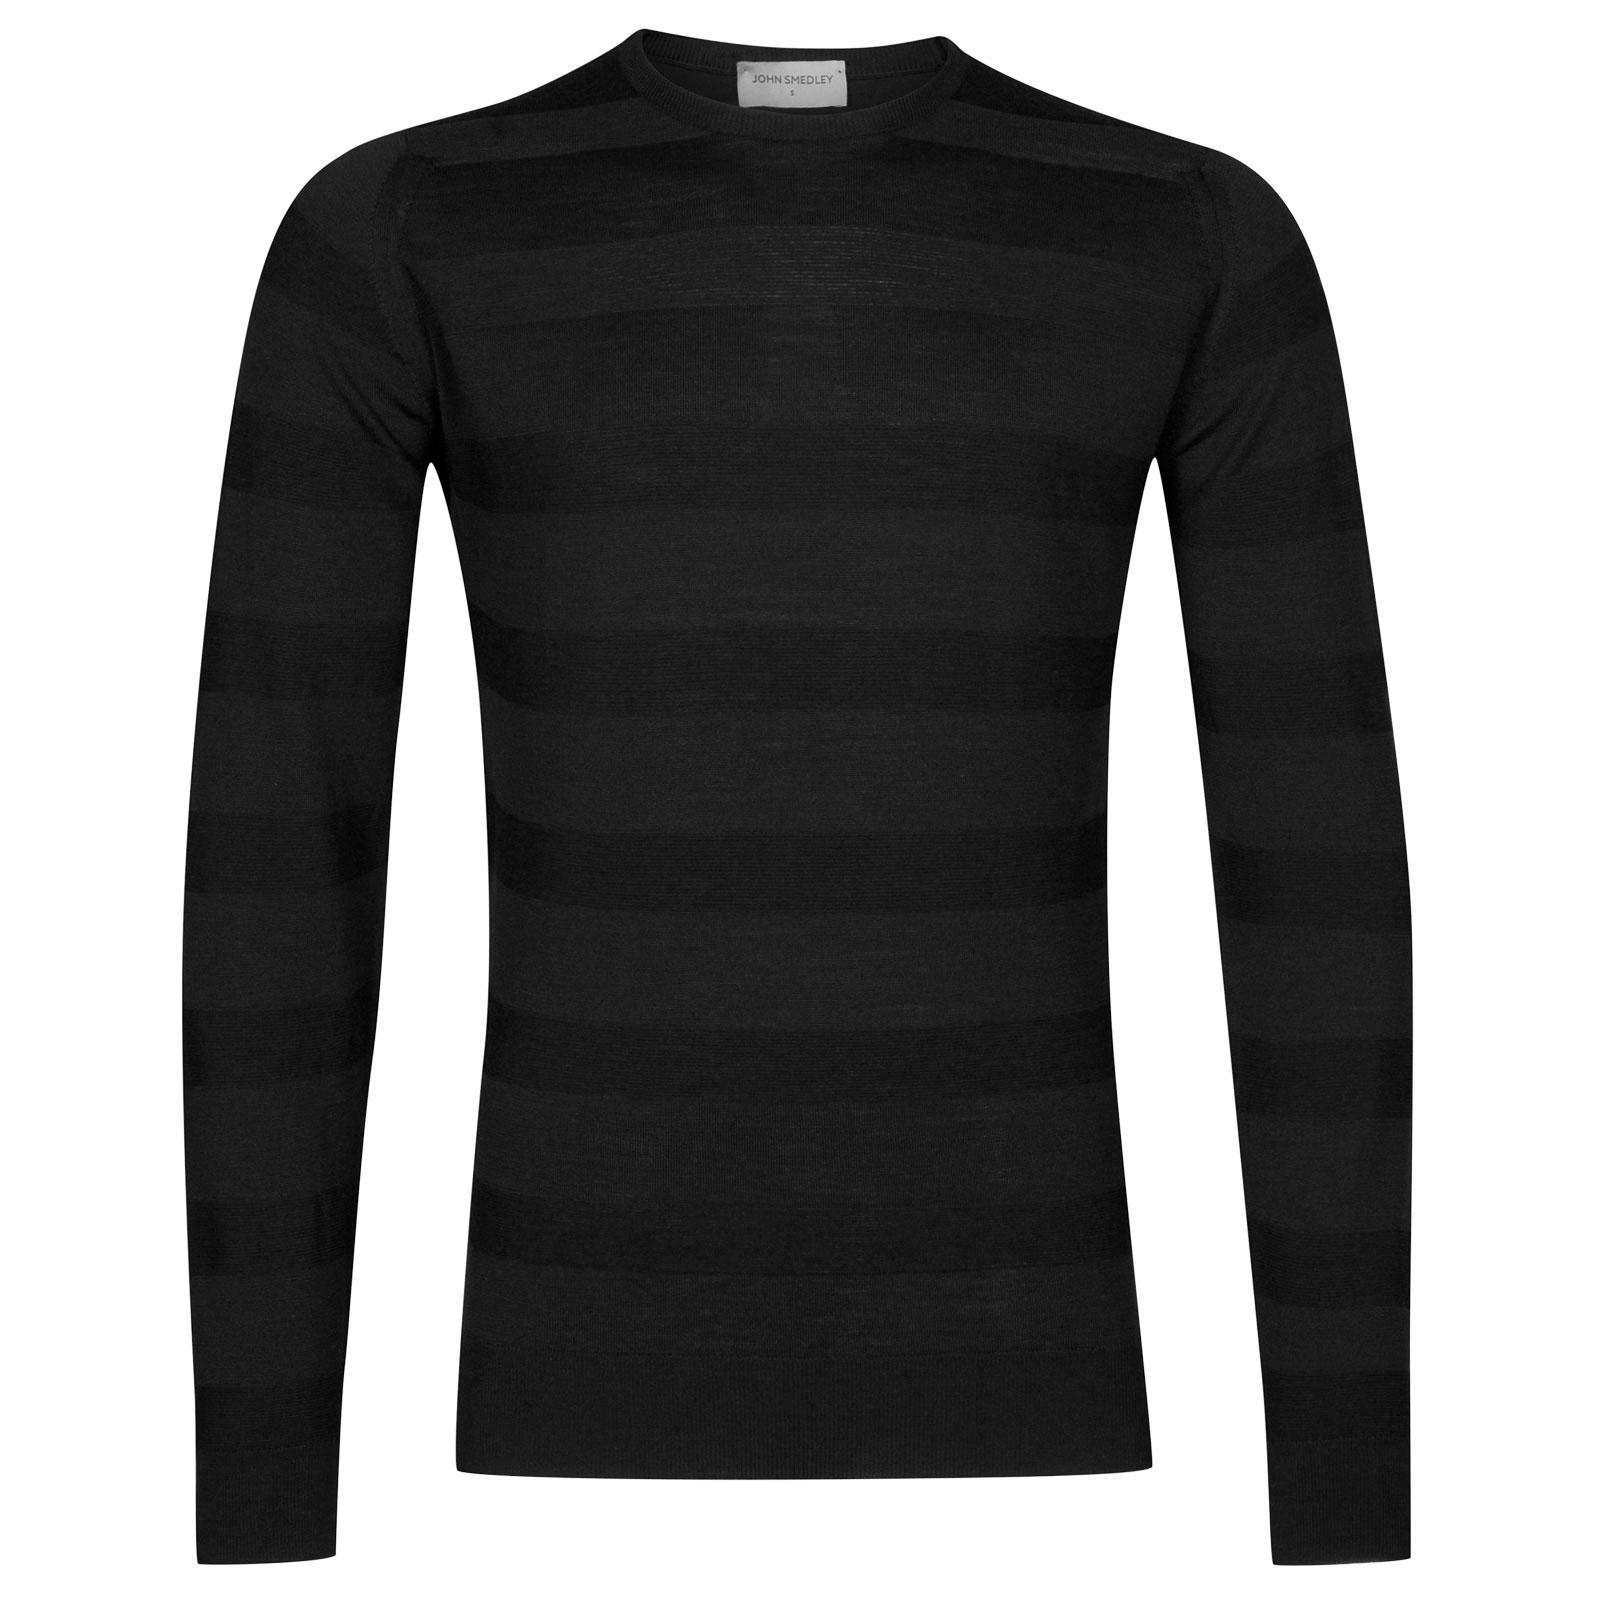 John Smedley coplow Merino Wool Pullover in Black-M